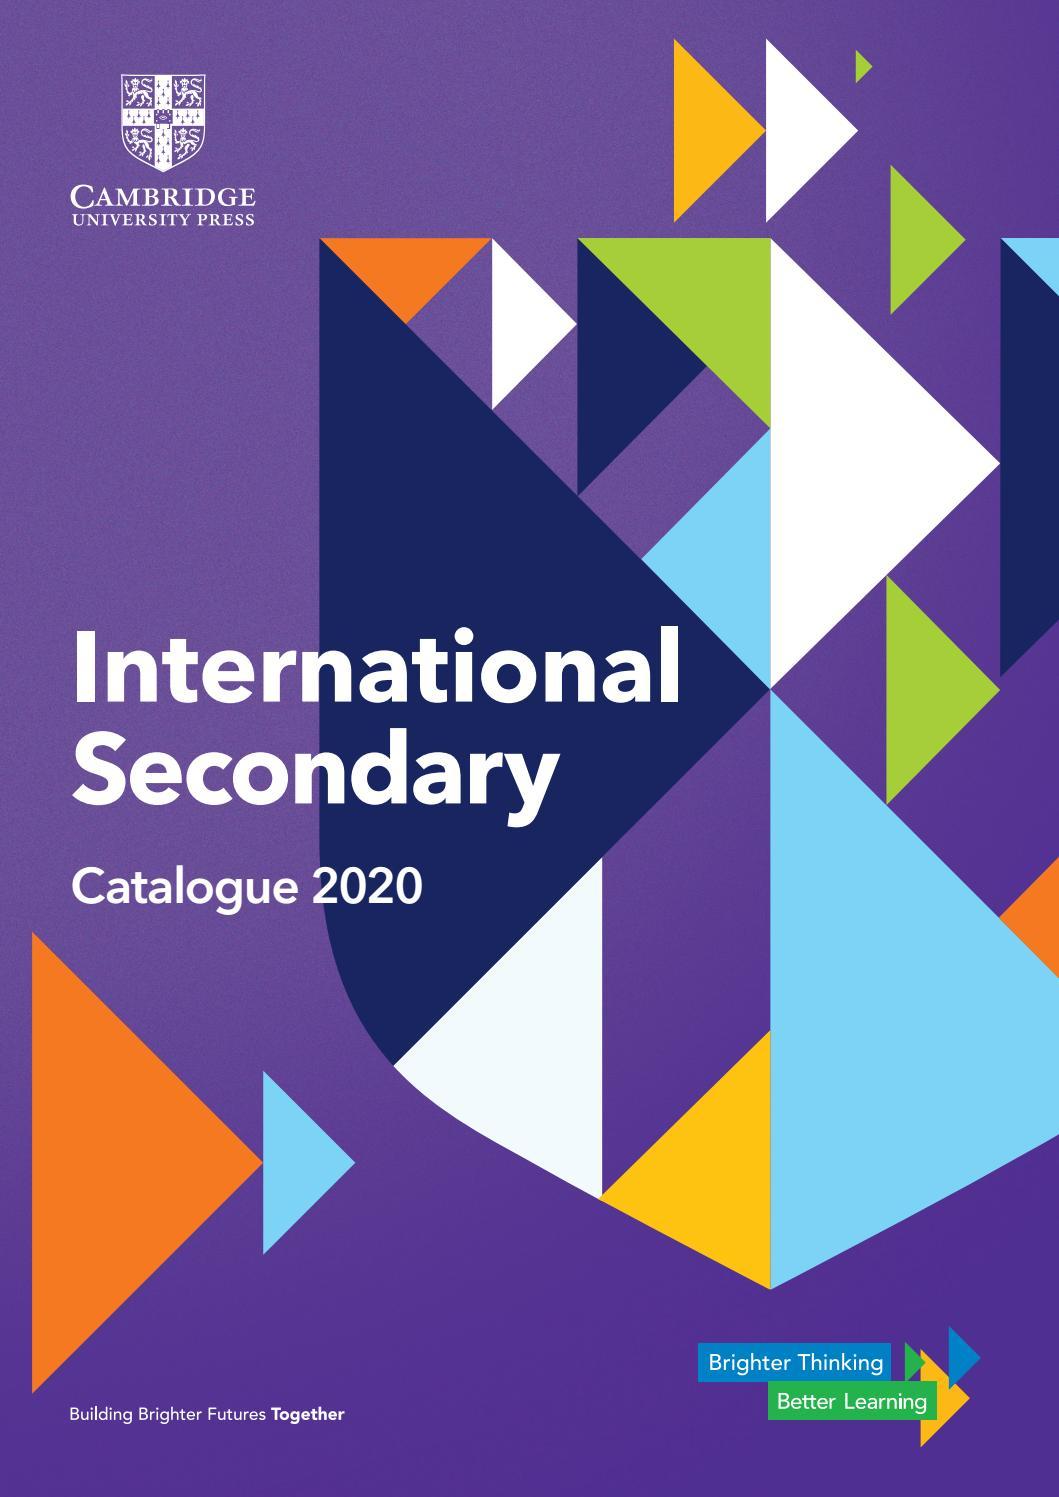 International Secondary 2020 Catalogue By Cambridge